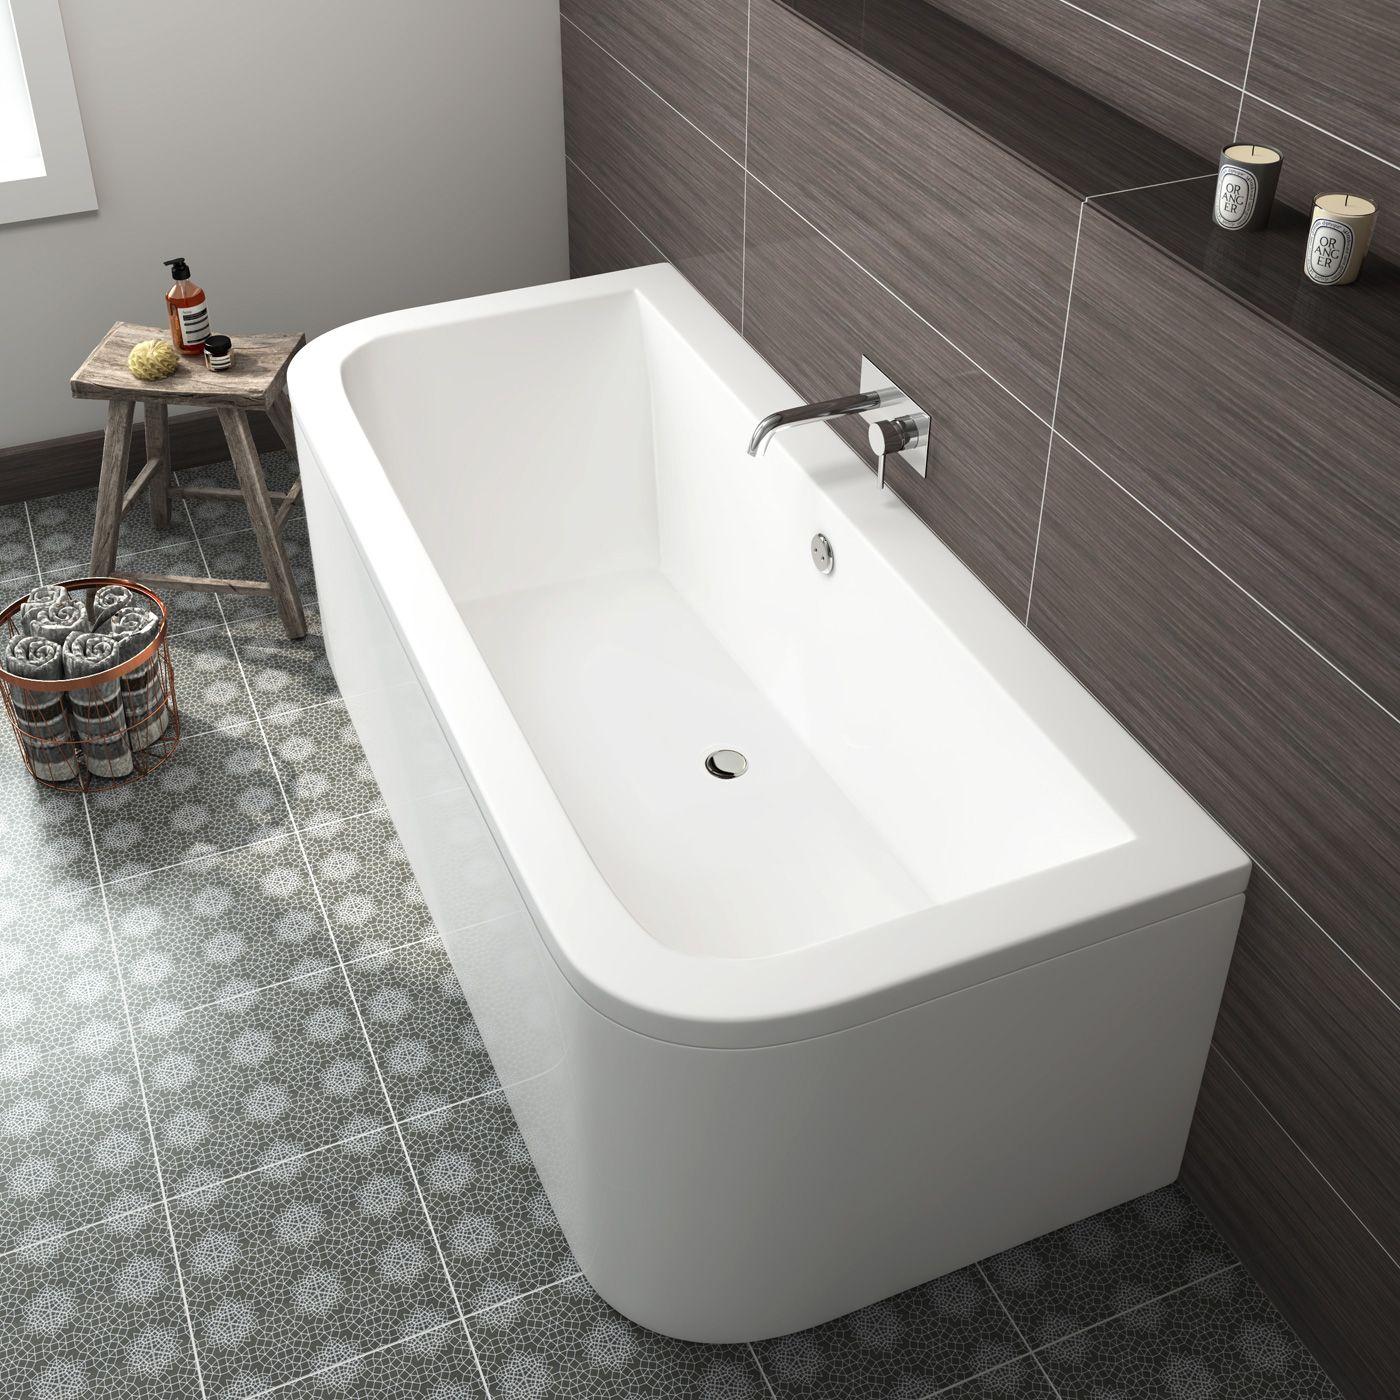 1700x750x460mm Back to Wall Bath | Delivery, Bath and Bathroom ...